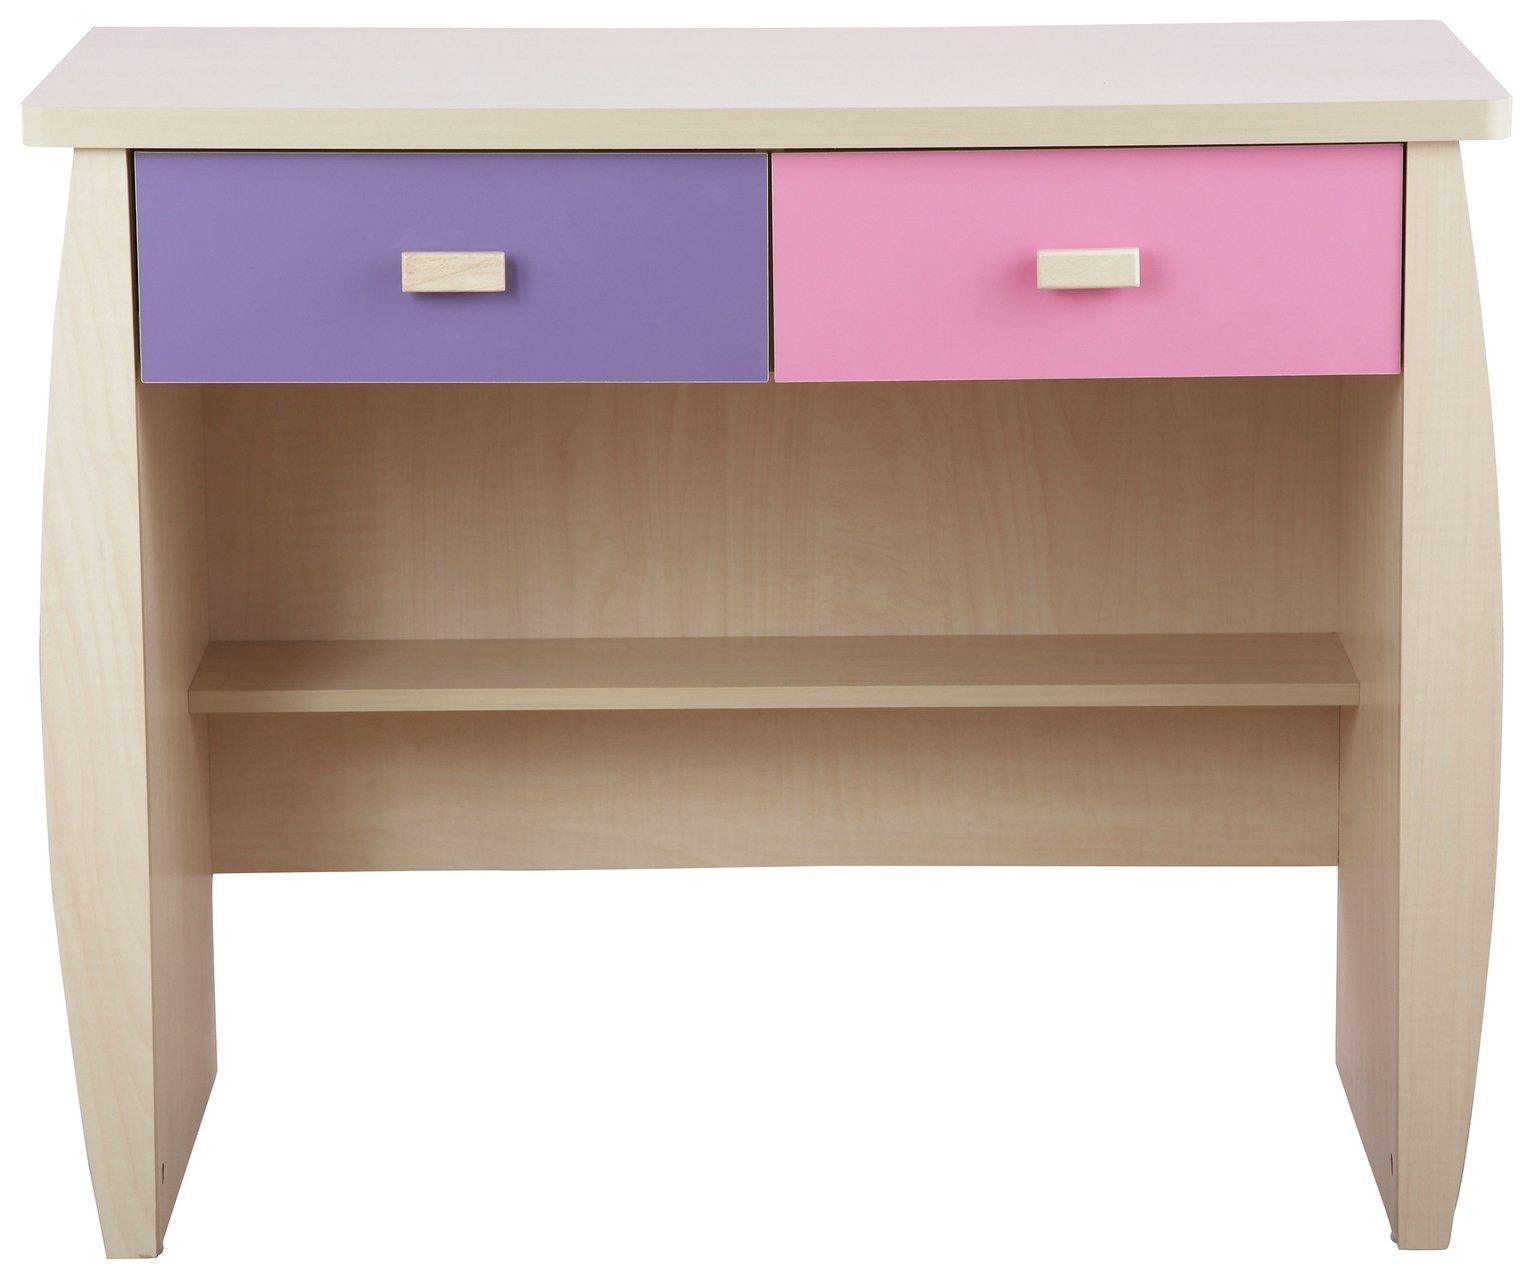 Image of GFW Sydney 2 Drawer Desk - Pink